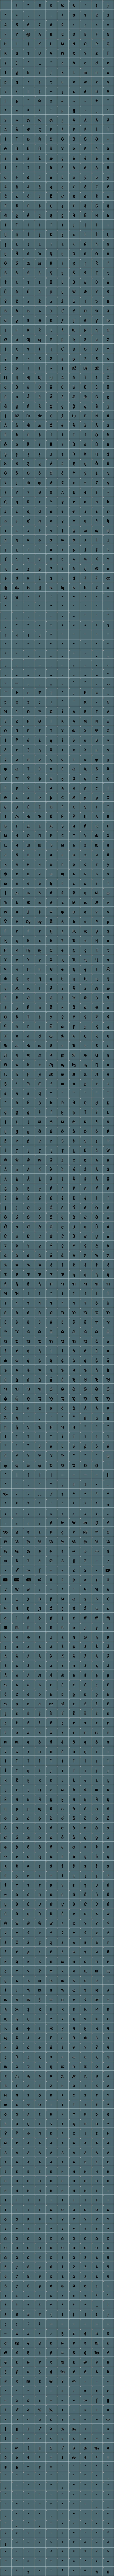 Fira Sans Font Free by Mozilla » Font Squirrel